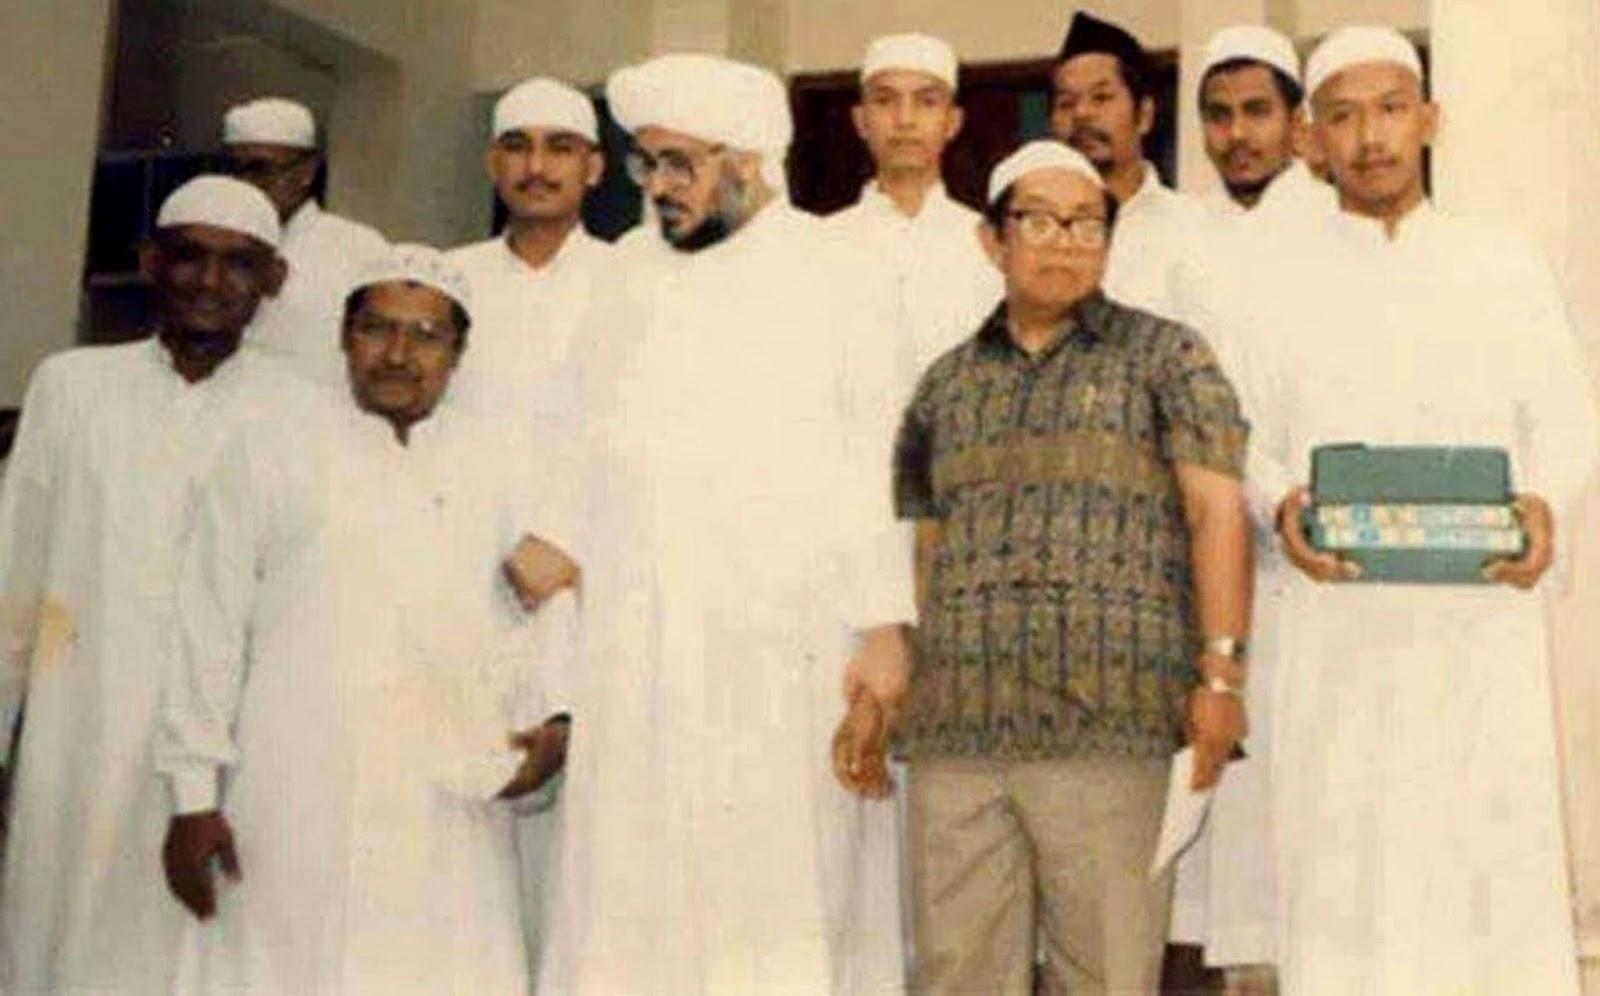 Sayyid Muhammad bin Alawi Al-Maliki